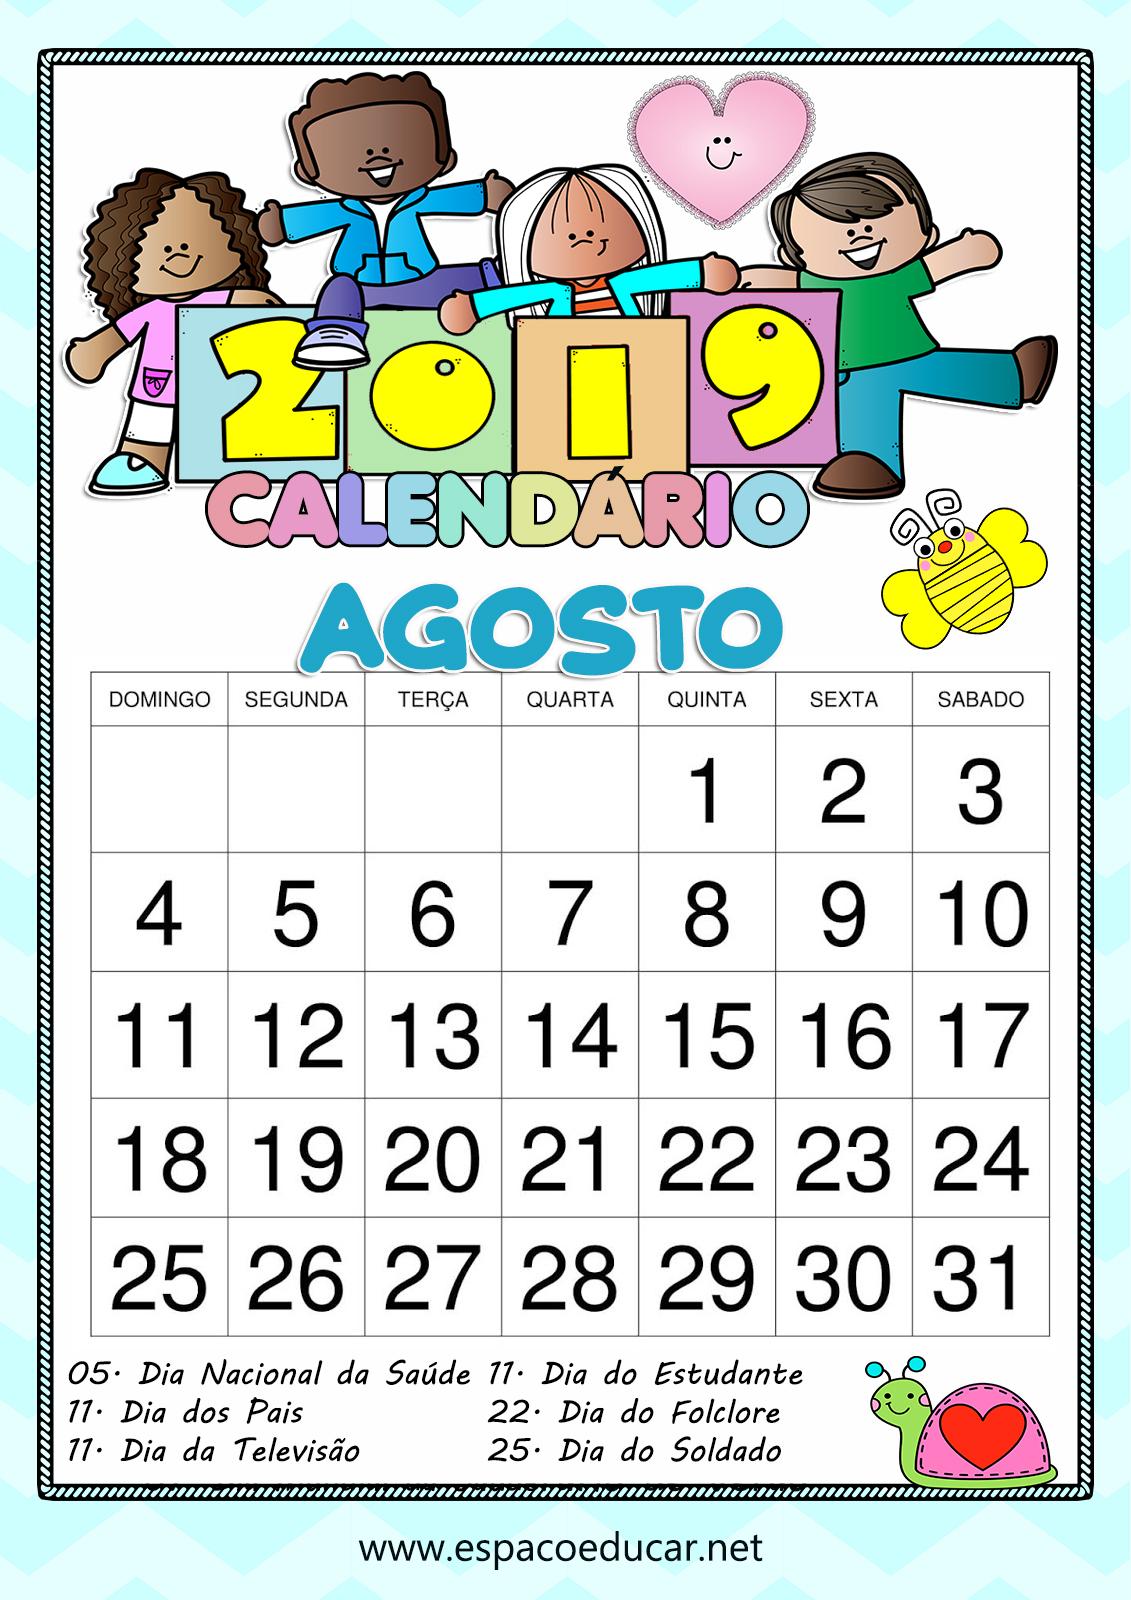 Calendario Agosto 2019 Con Feriados.Calendario Agosto De 2019 Para Imprimir Com Feriados E Datas